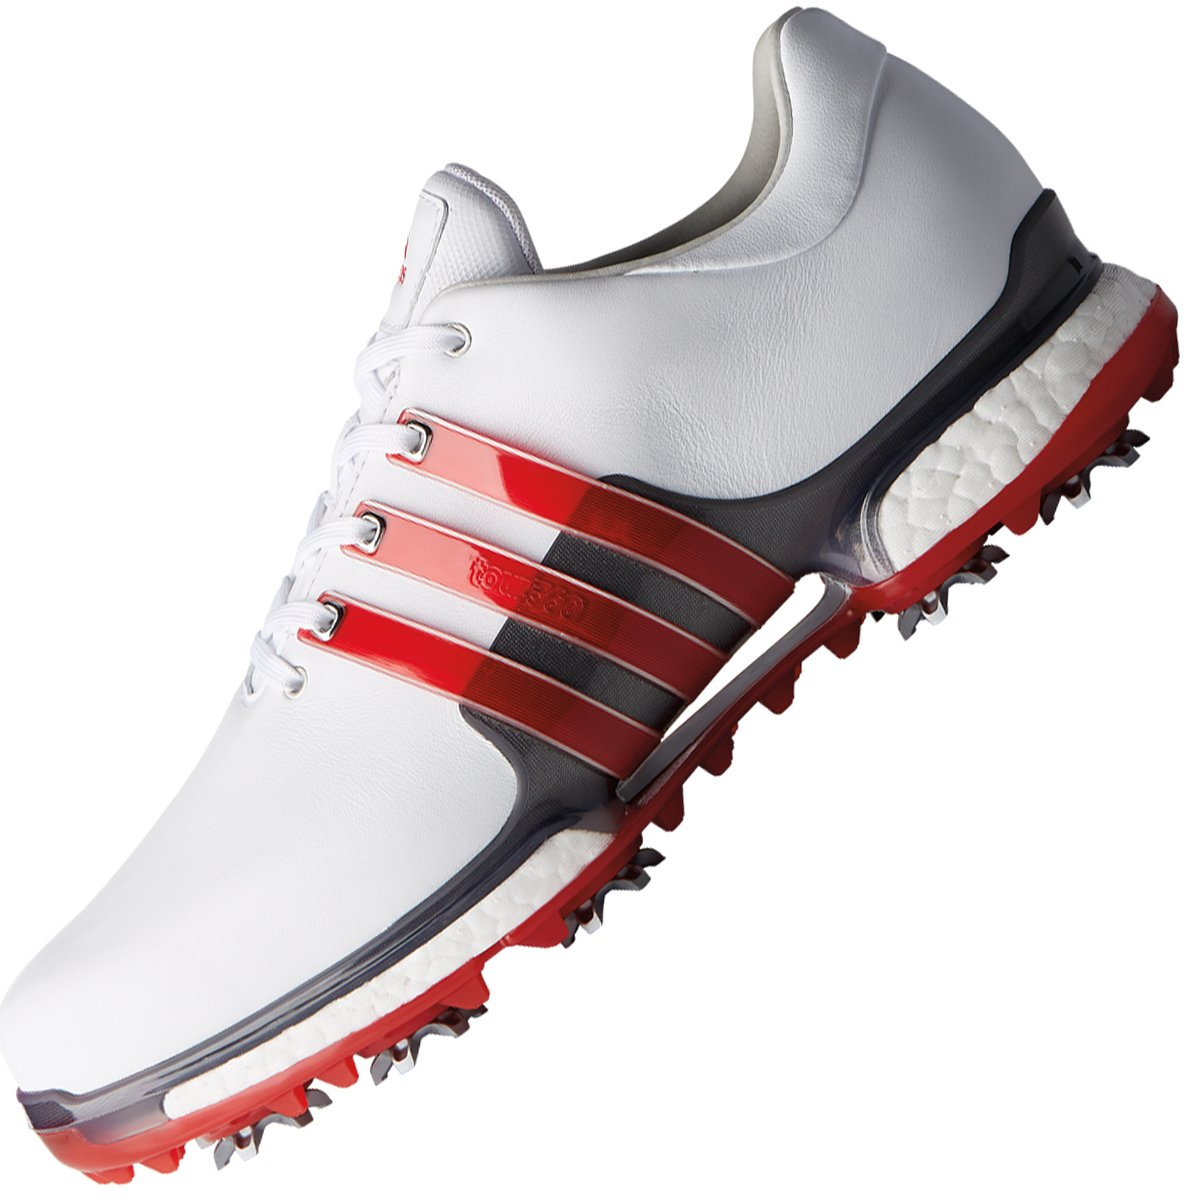 Adidas Golf 2018 tour360 2.0 Boostレザーメンズゴルフシューズ – Wide継手 B079T8GPZZ 9.5UK/44EU/10US ホワイト/スカーレット ホワイト/スカーレット 9.5UK/44EU/10US